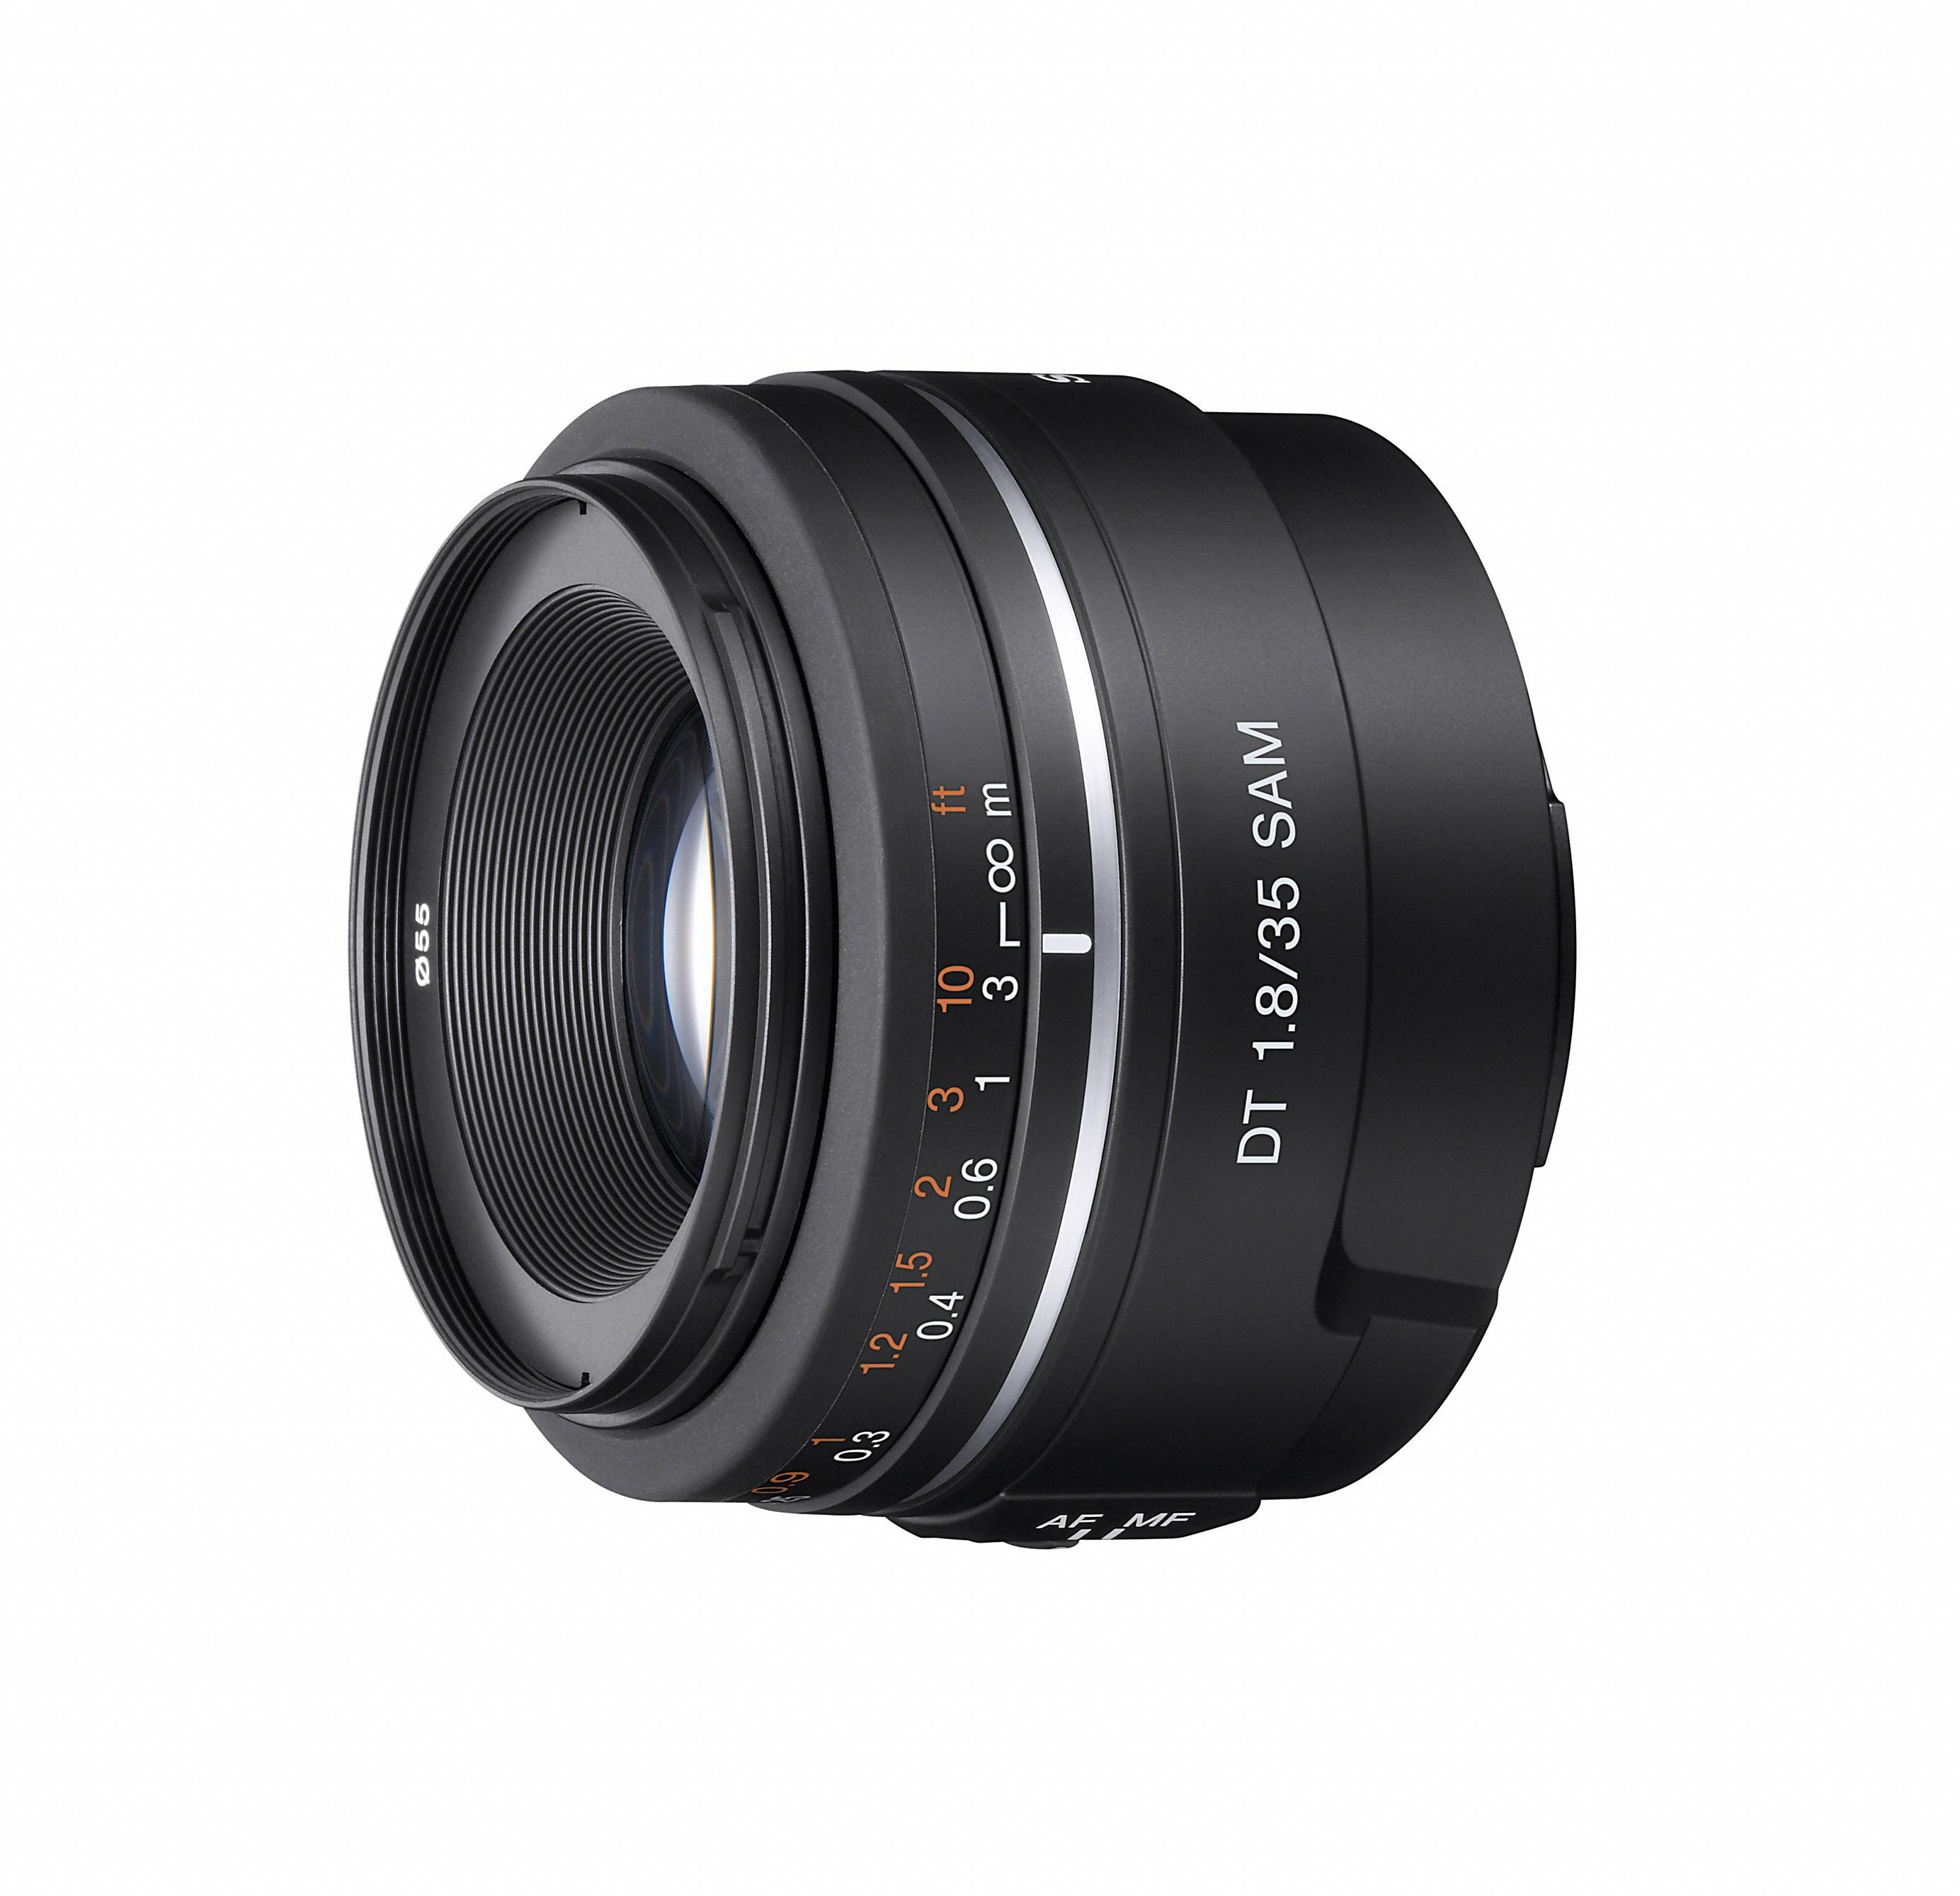 DT 35mm f/1.8 SAM